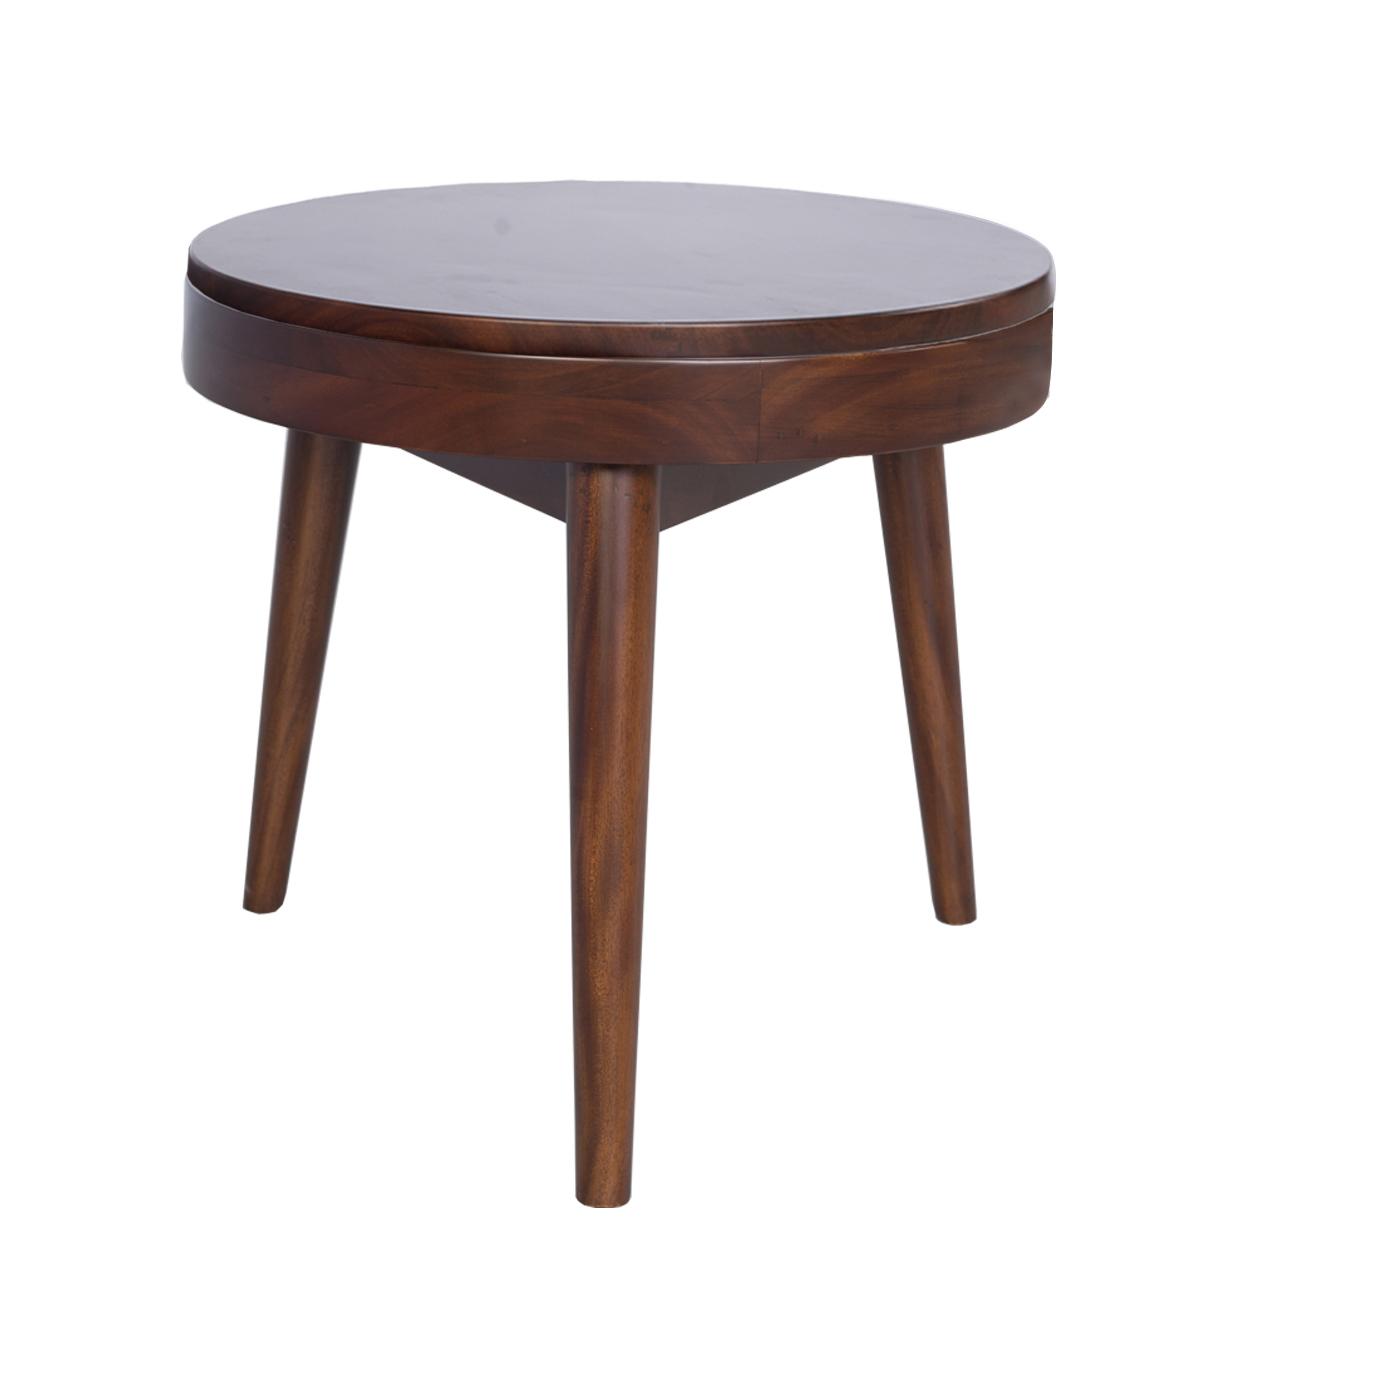 Dalian Dark Side Table